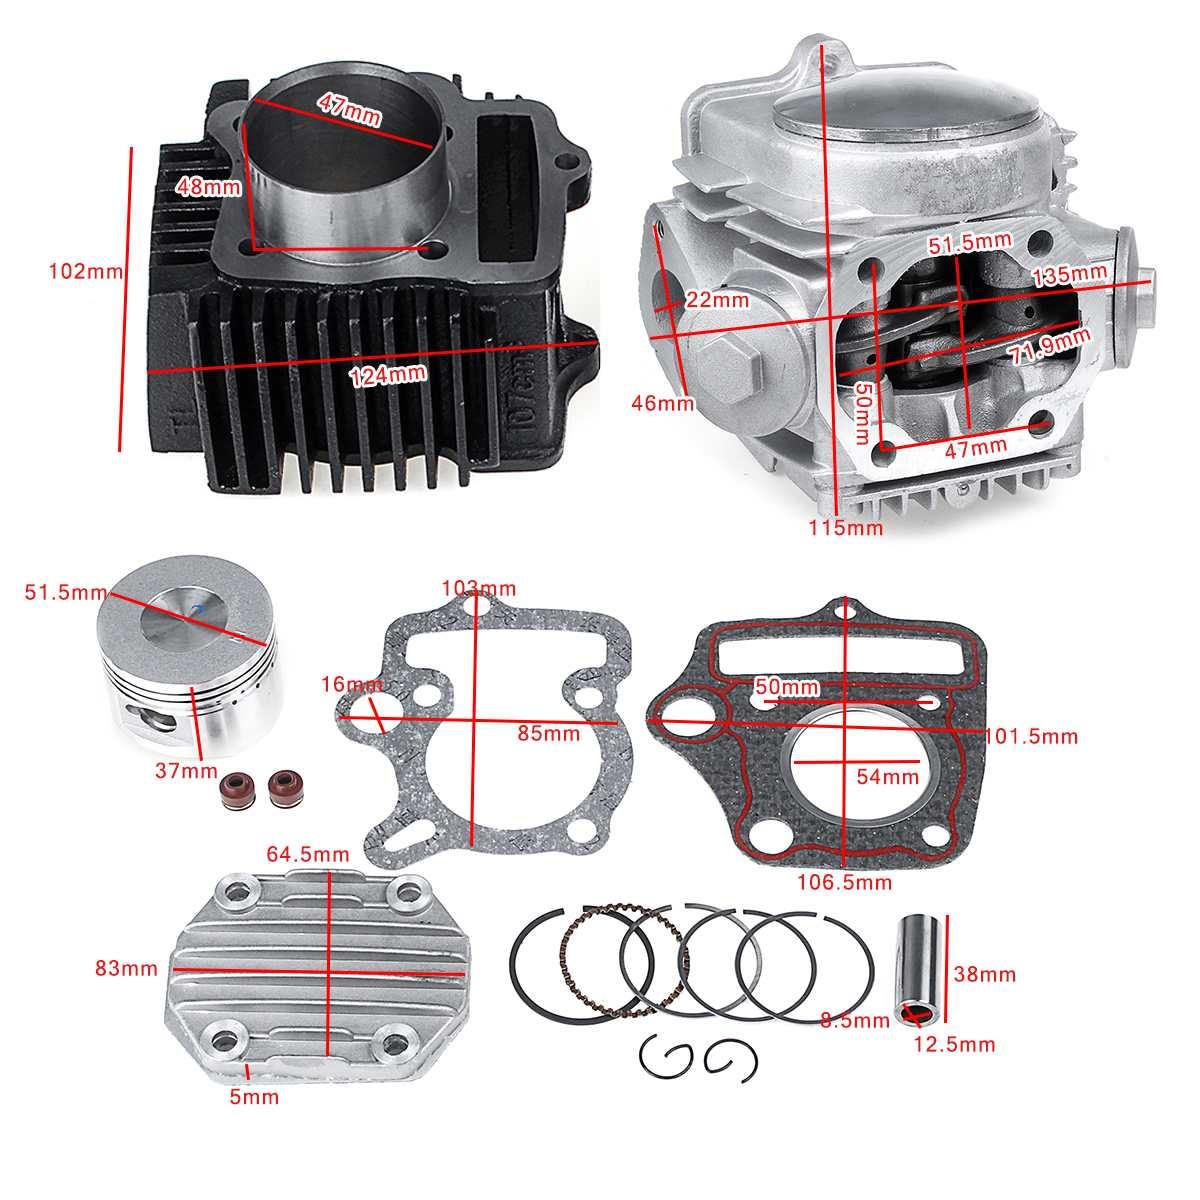 Magneto Stator 18 Pole 200cc 250cc Bashan Taotao Dirt Bike ATV Quad Coil 89mm